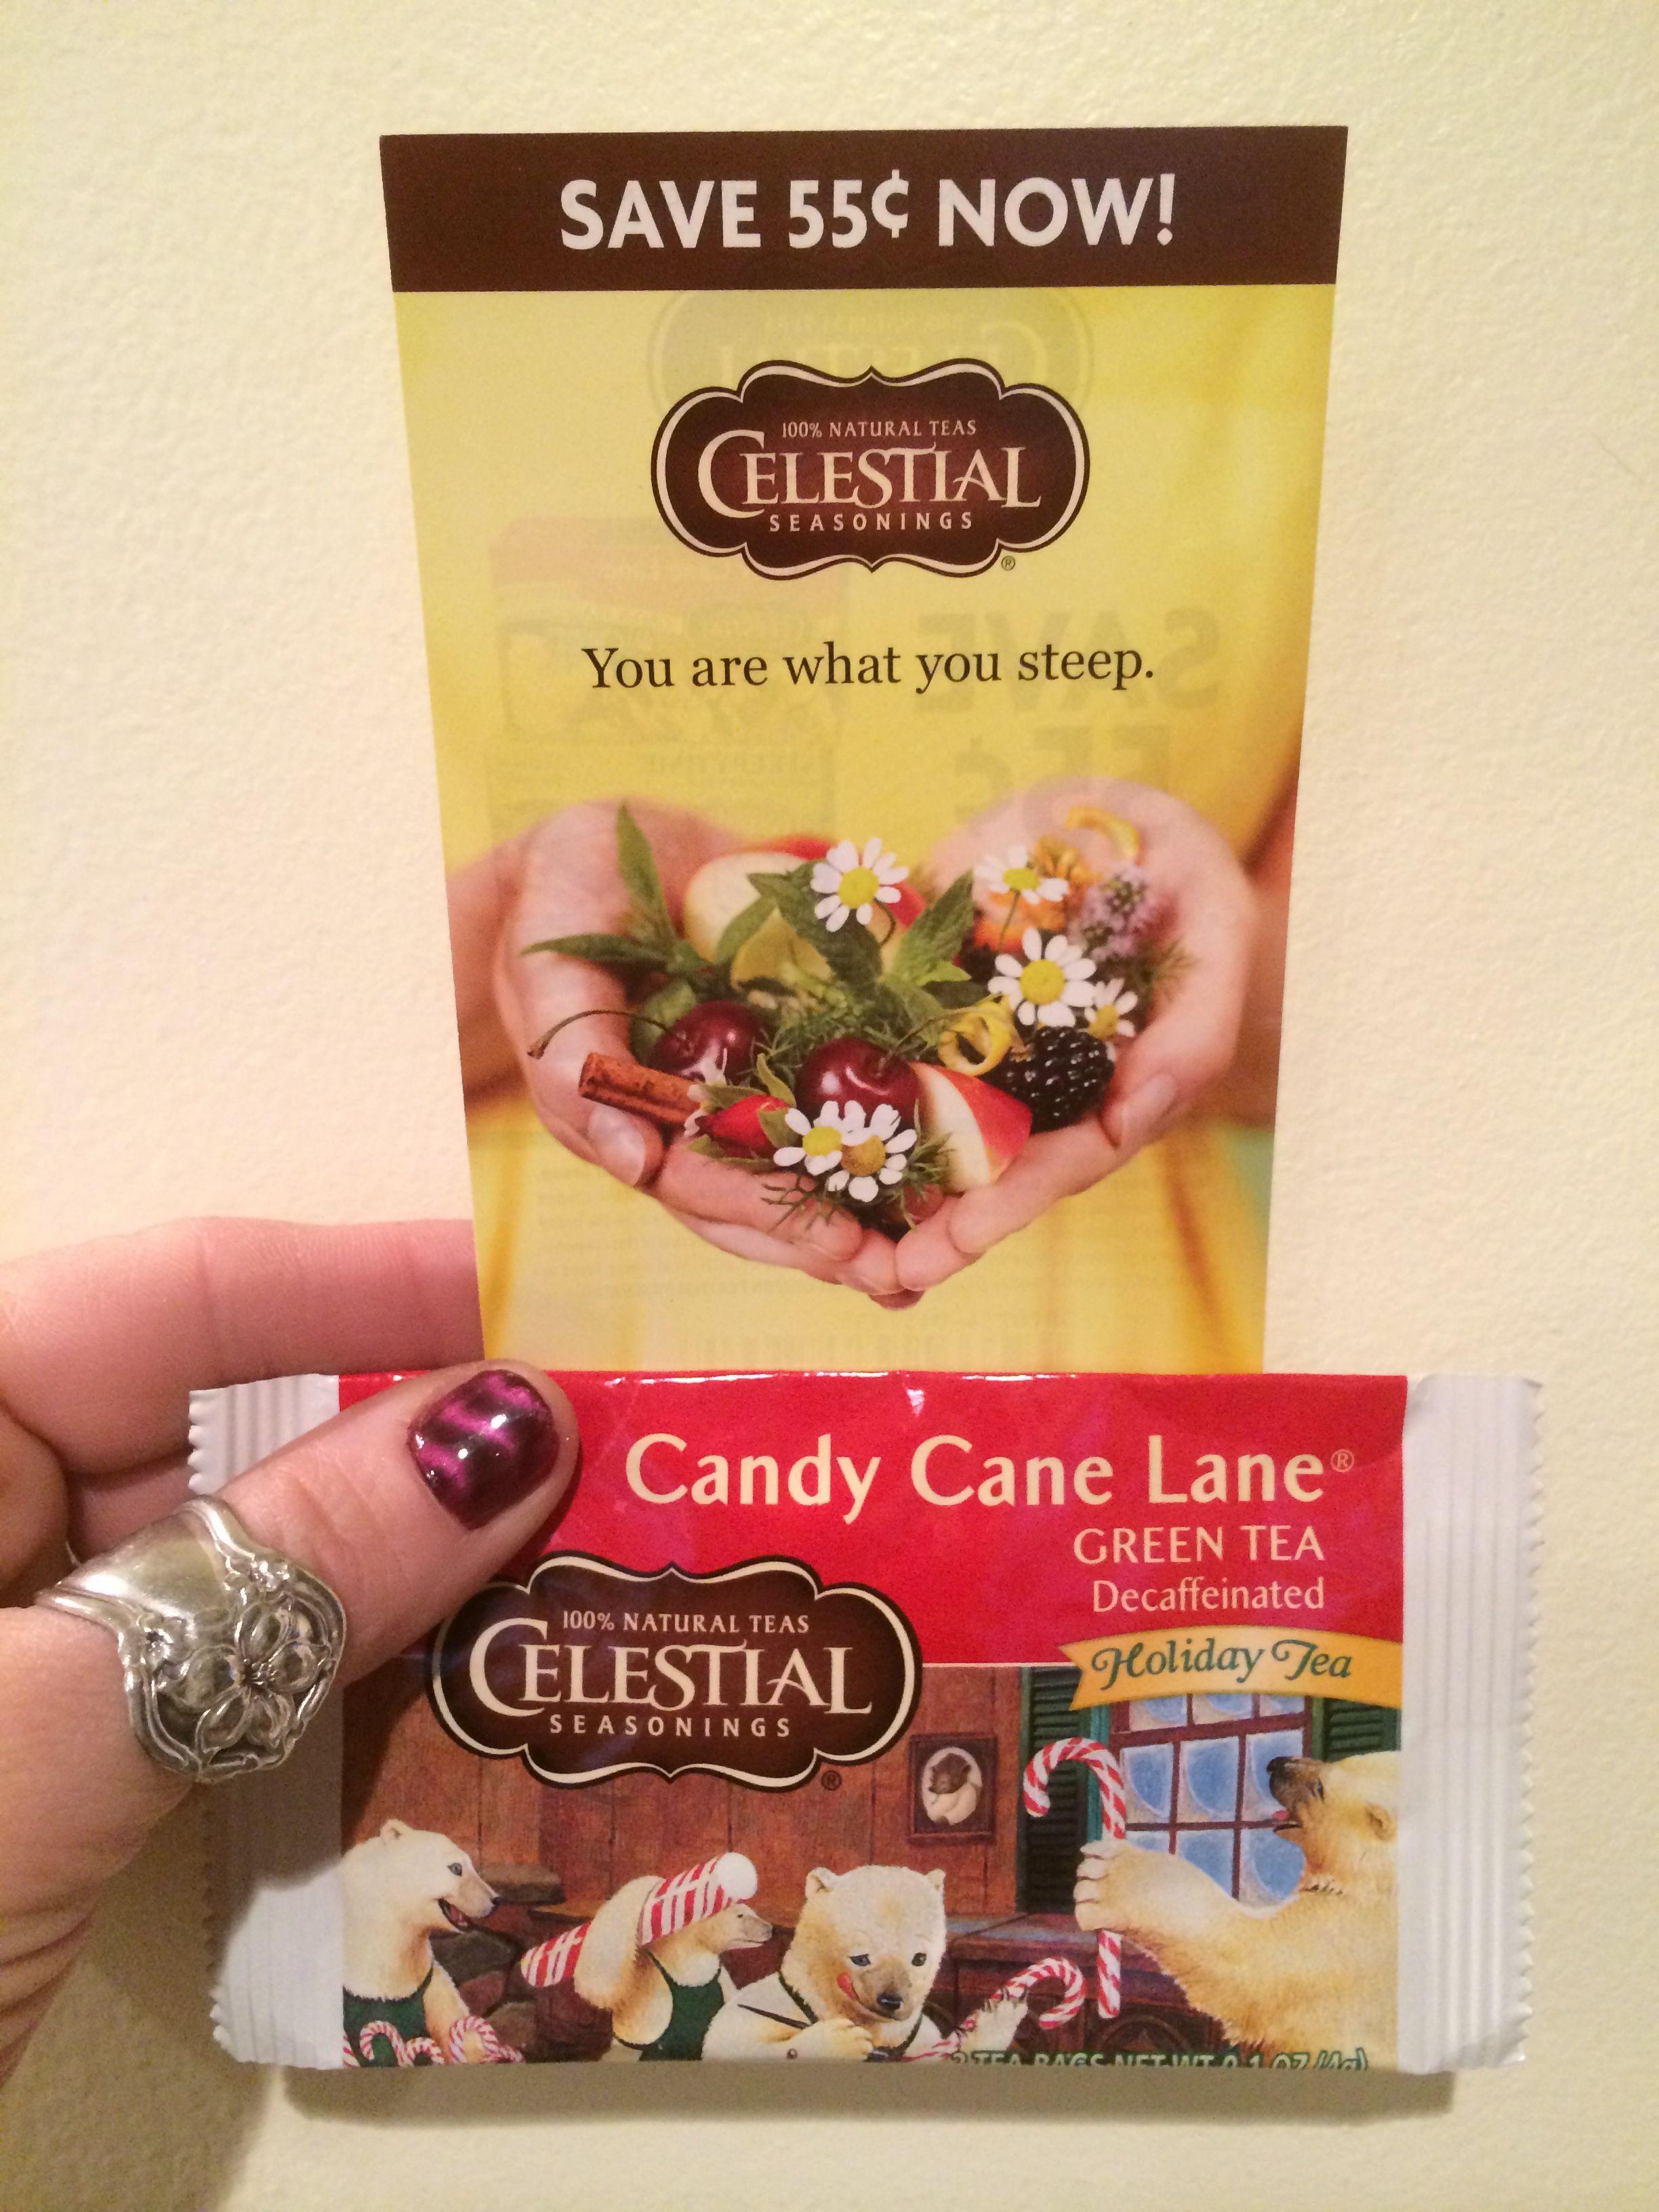 Celestial Seasonings Candy Cane Lane Decaf Green Tea is